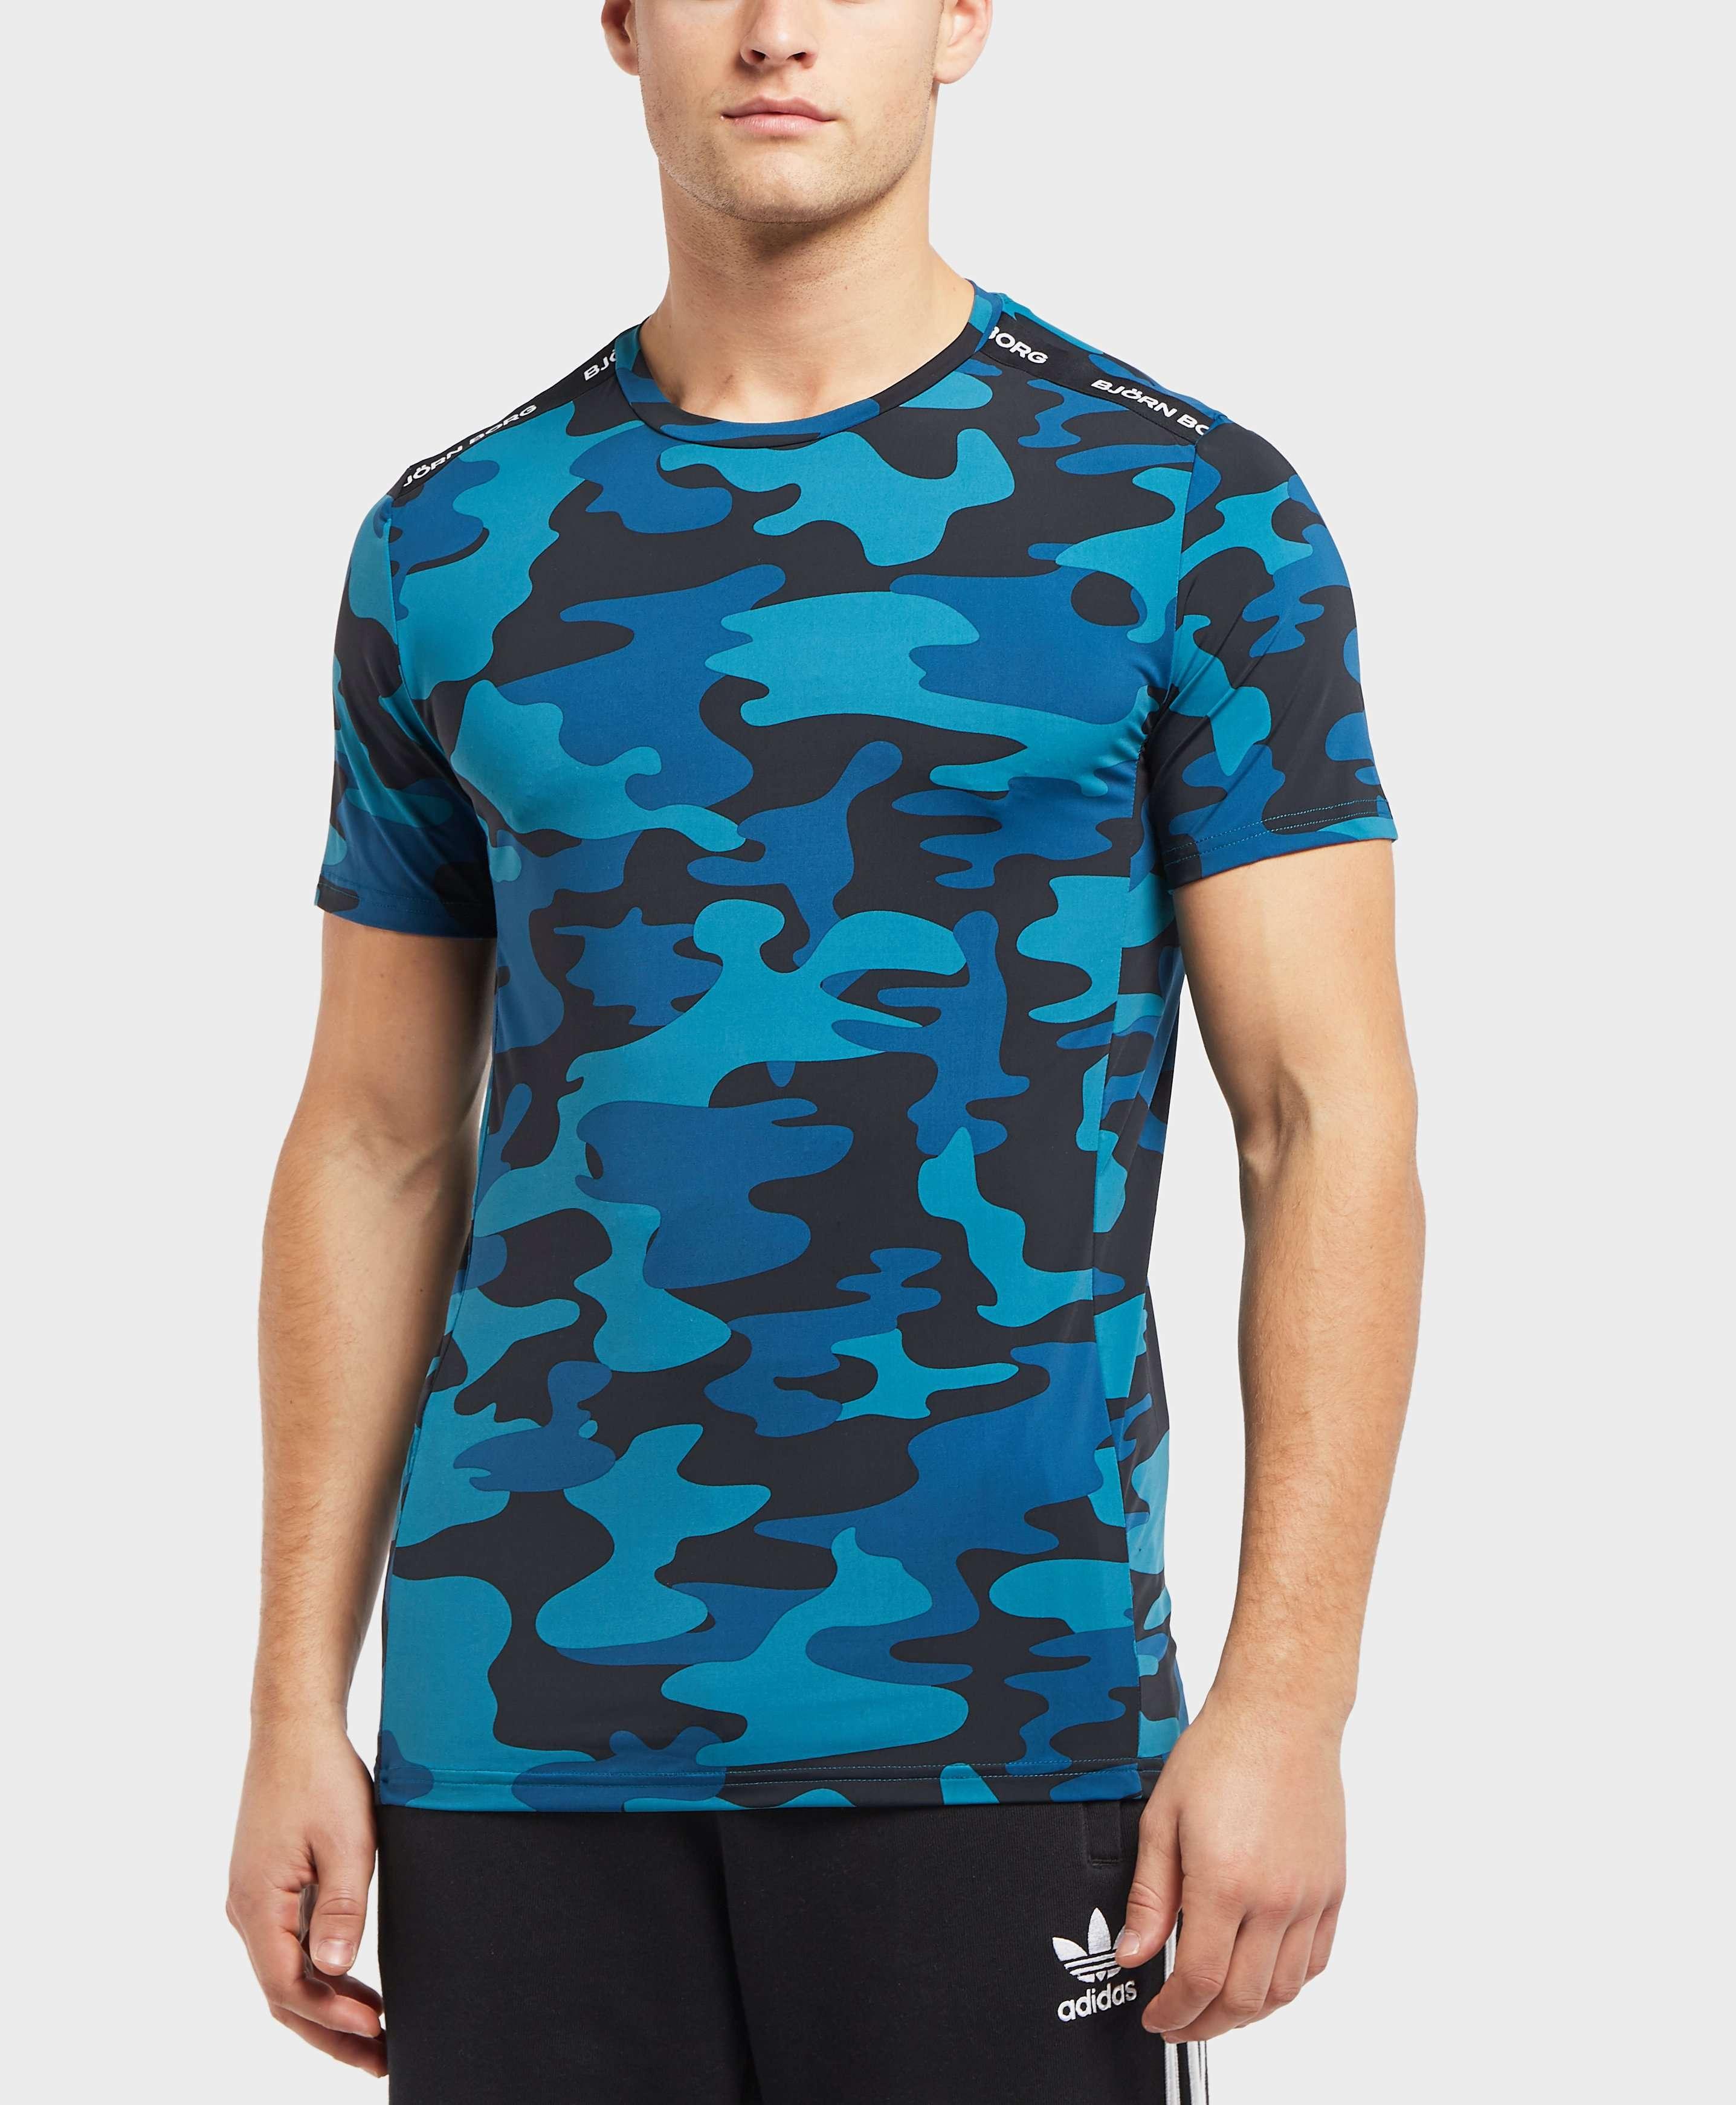 Bjorn Borg Hector Tape Camo Short Sleeve T-Shirt